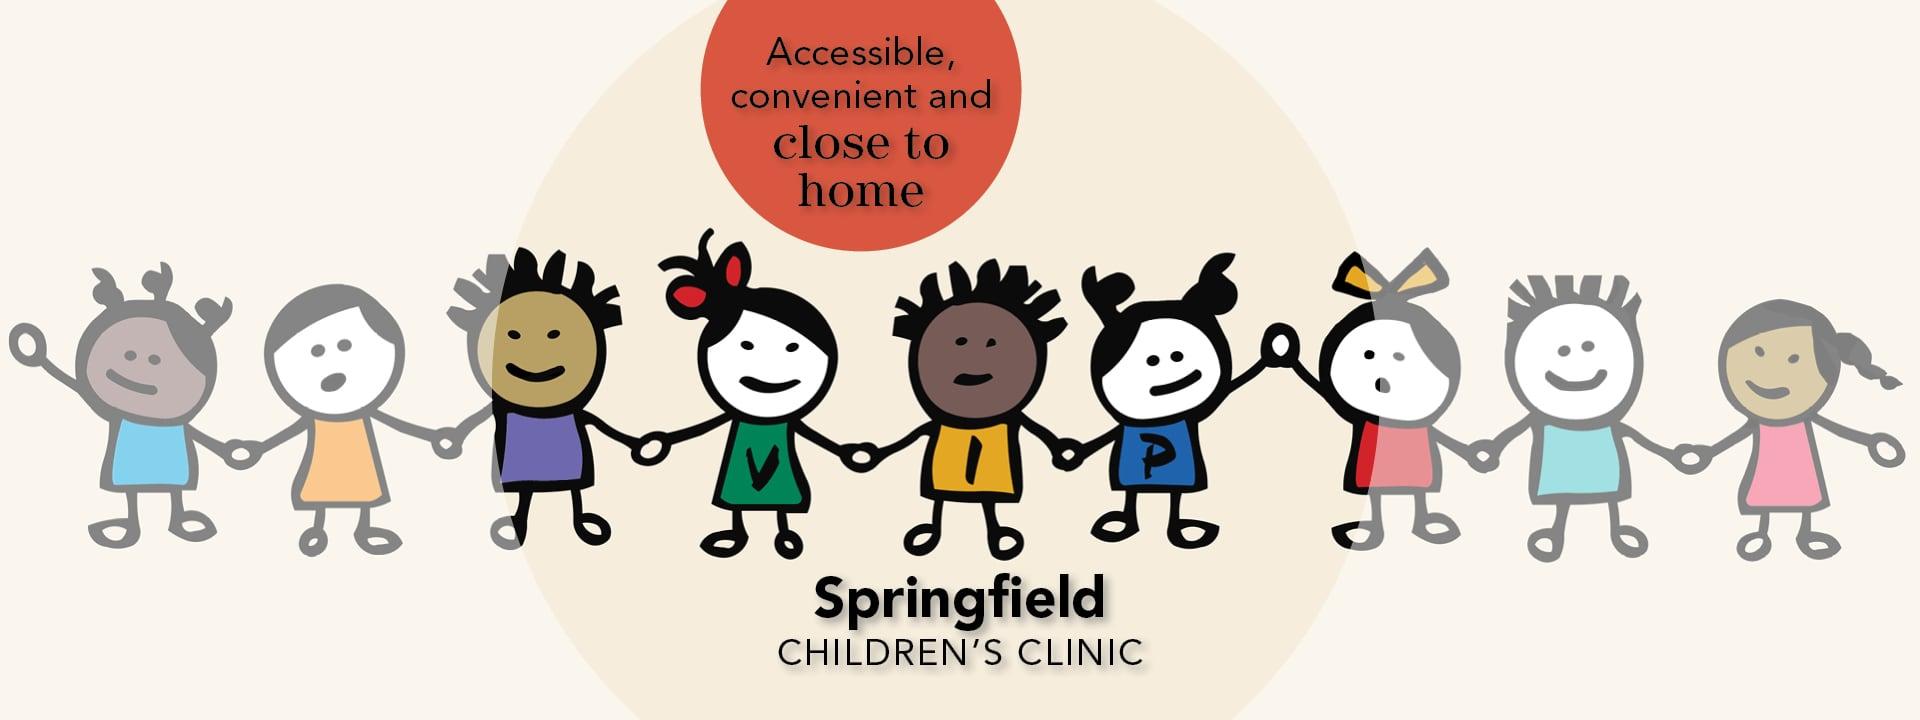 VIP Children's Clinics Children's Clinic Springfield TN